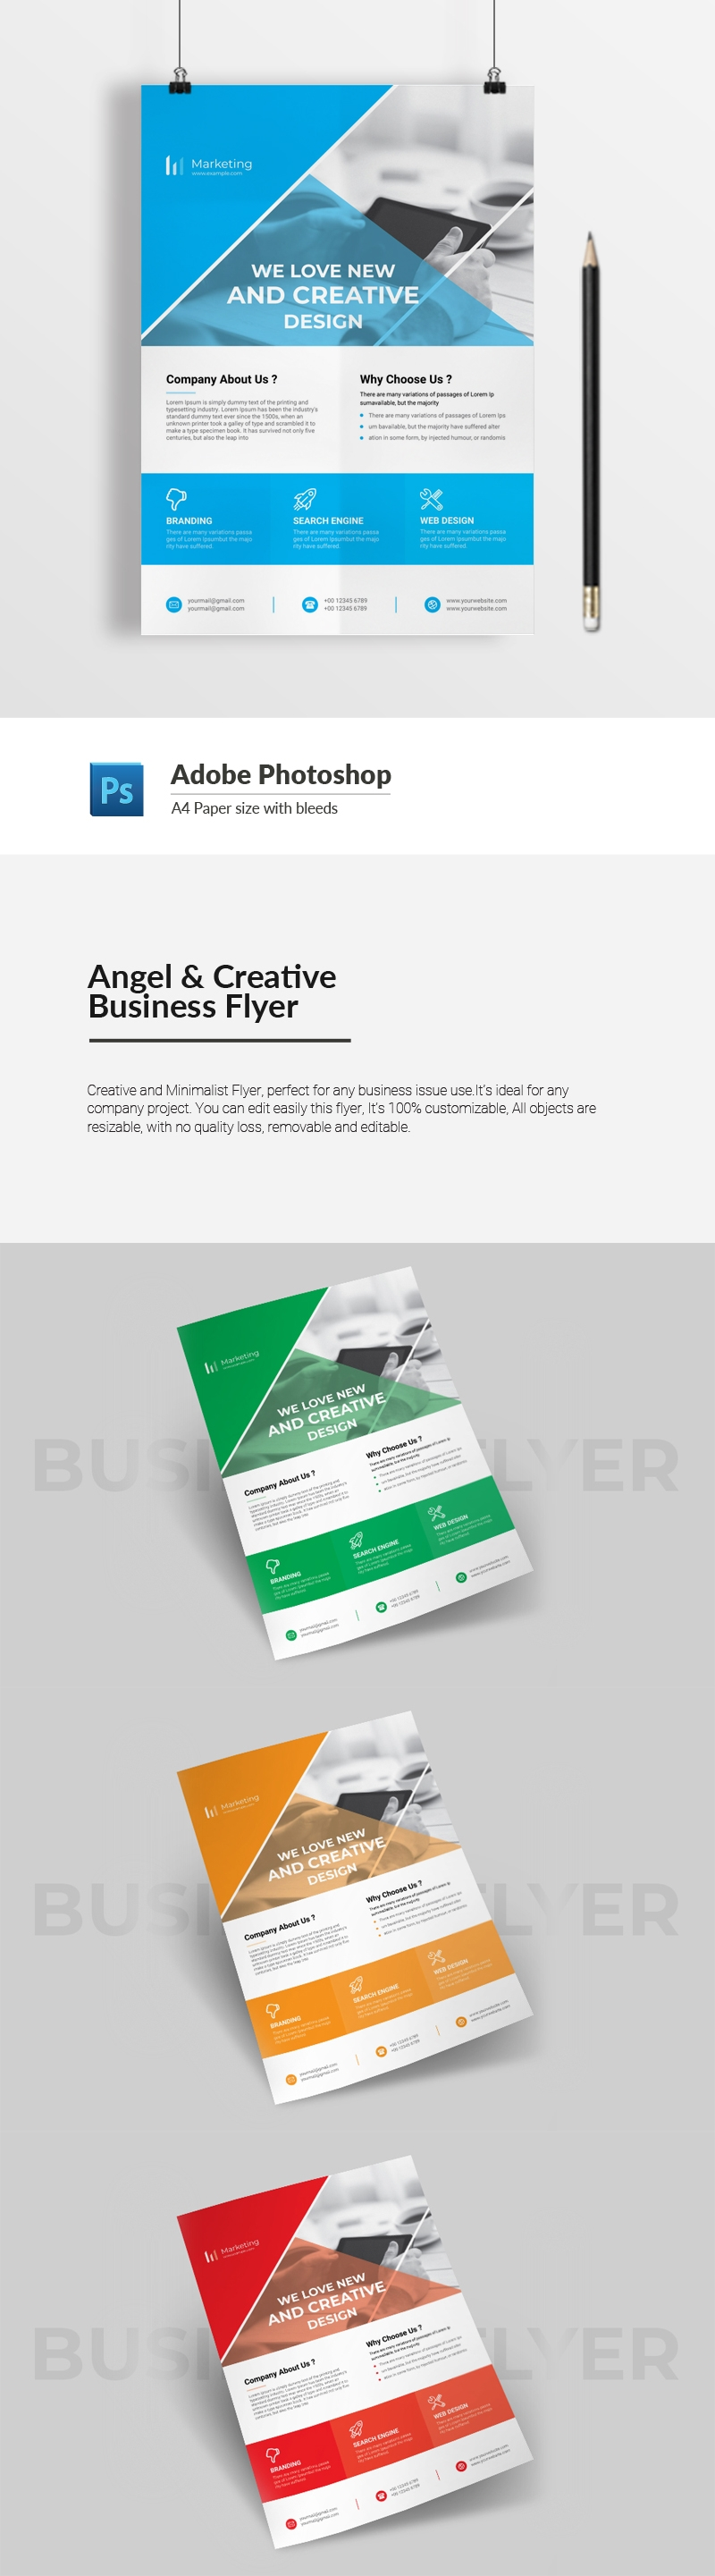 Angel & Creative Business Flyer